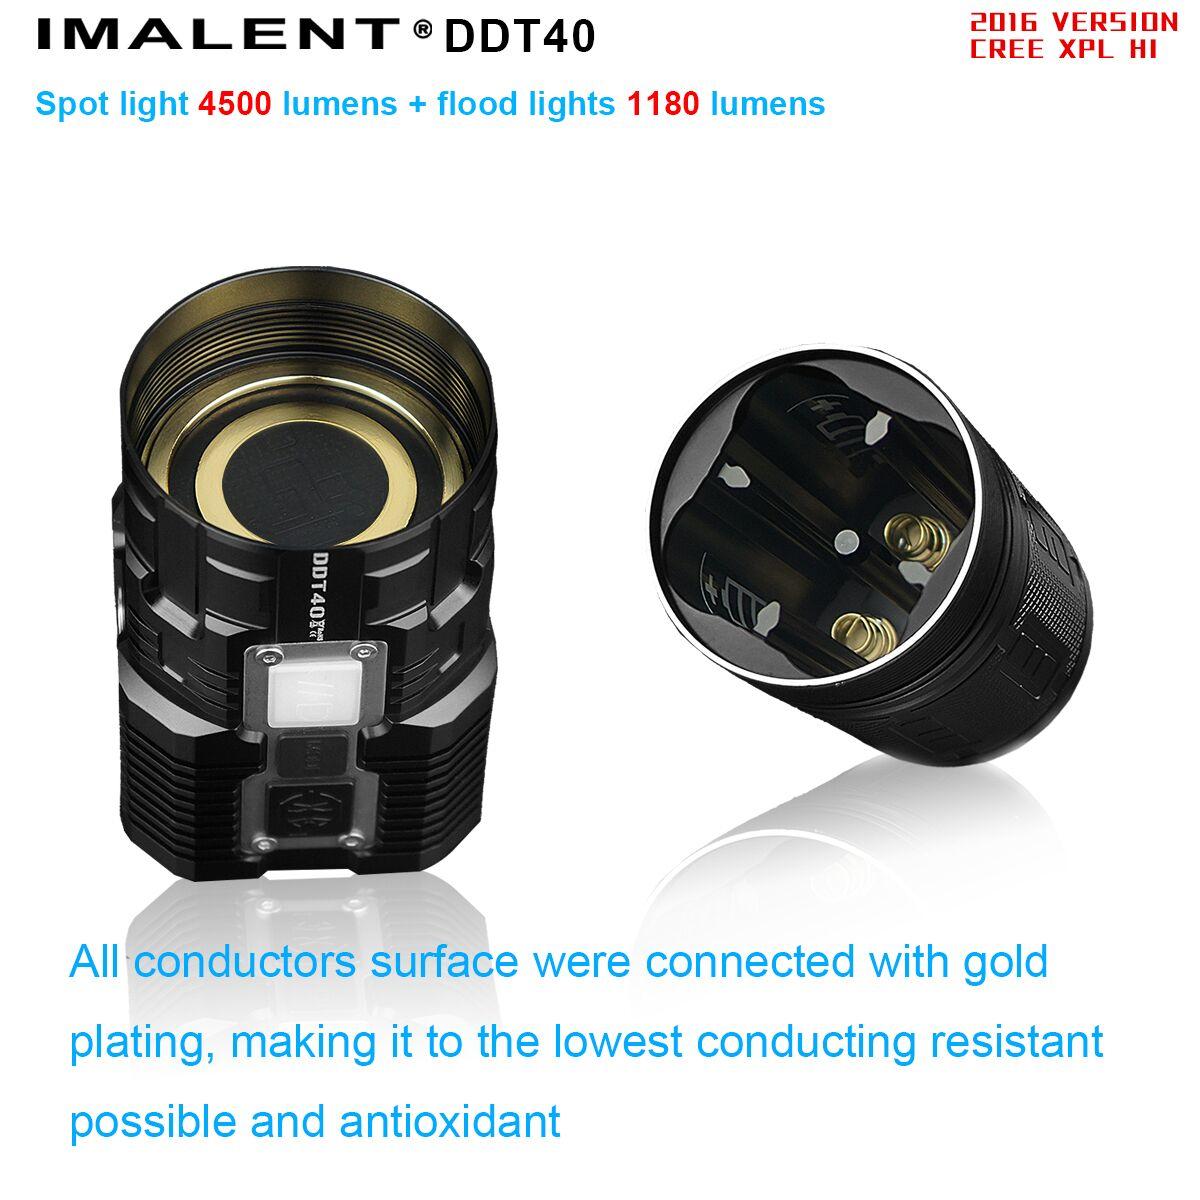 linterna DDT40 potente sumergible IPX8